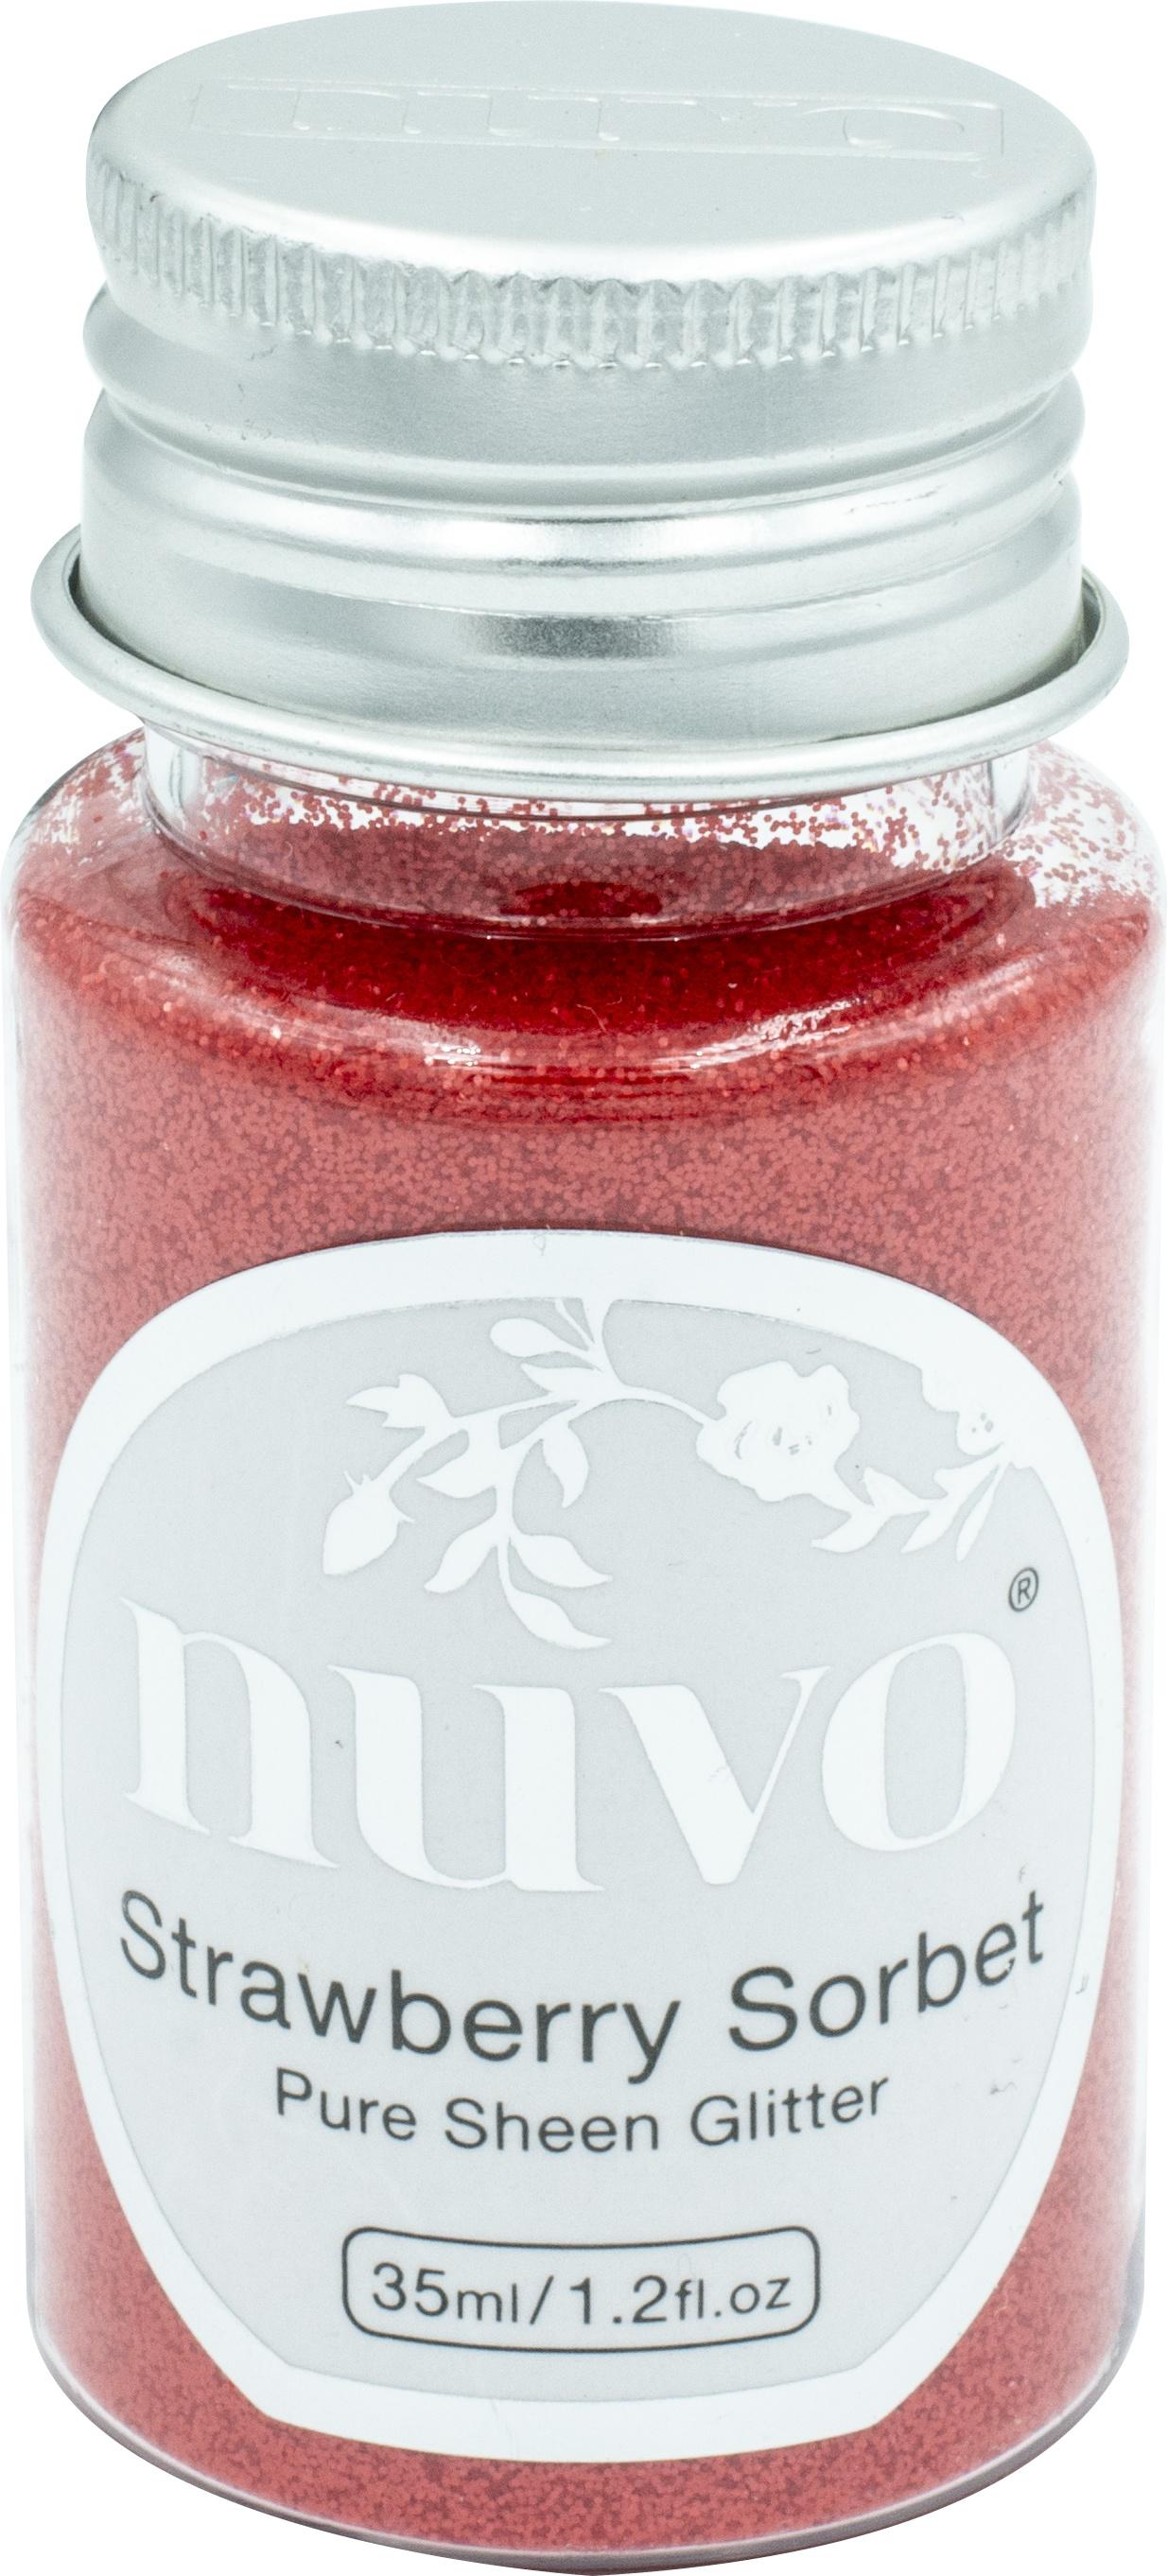 Nuvo Pure Sheen Glitter - Strawberry Sorbet (1116n)